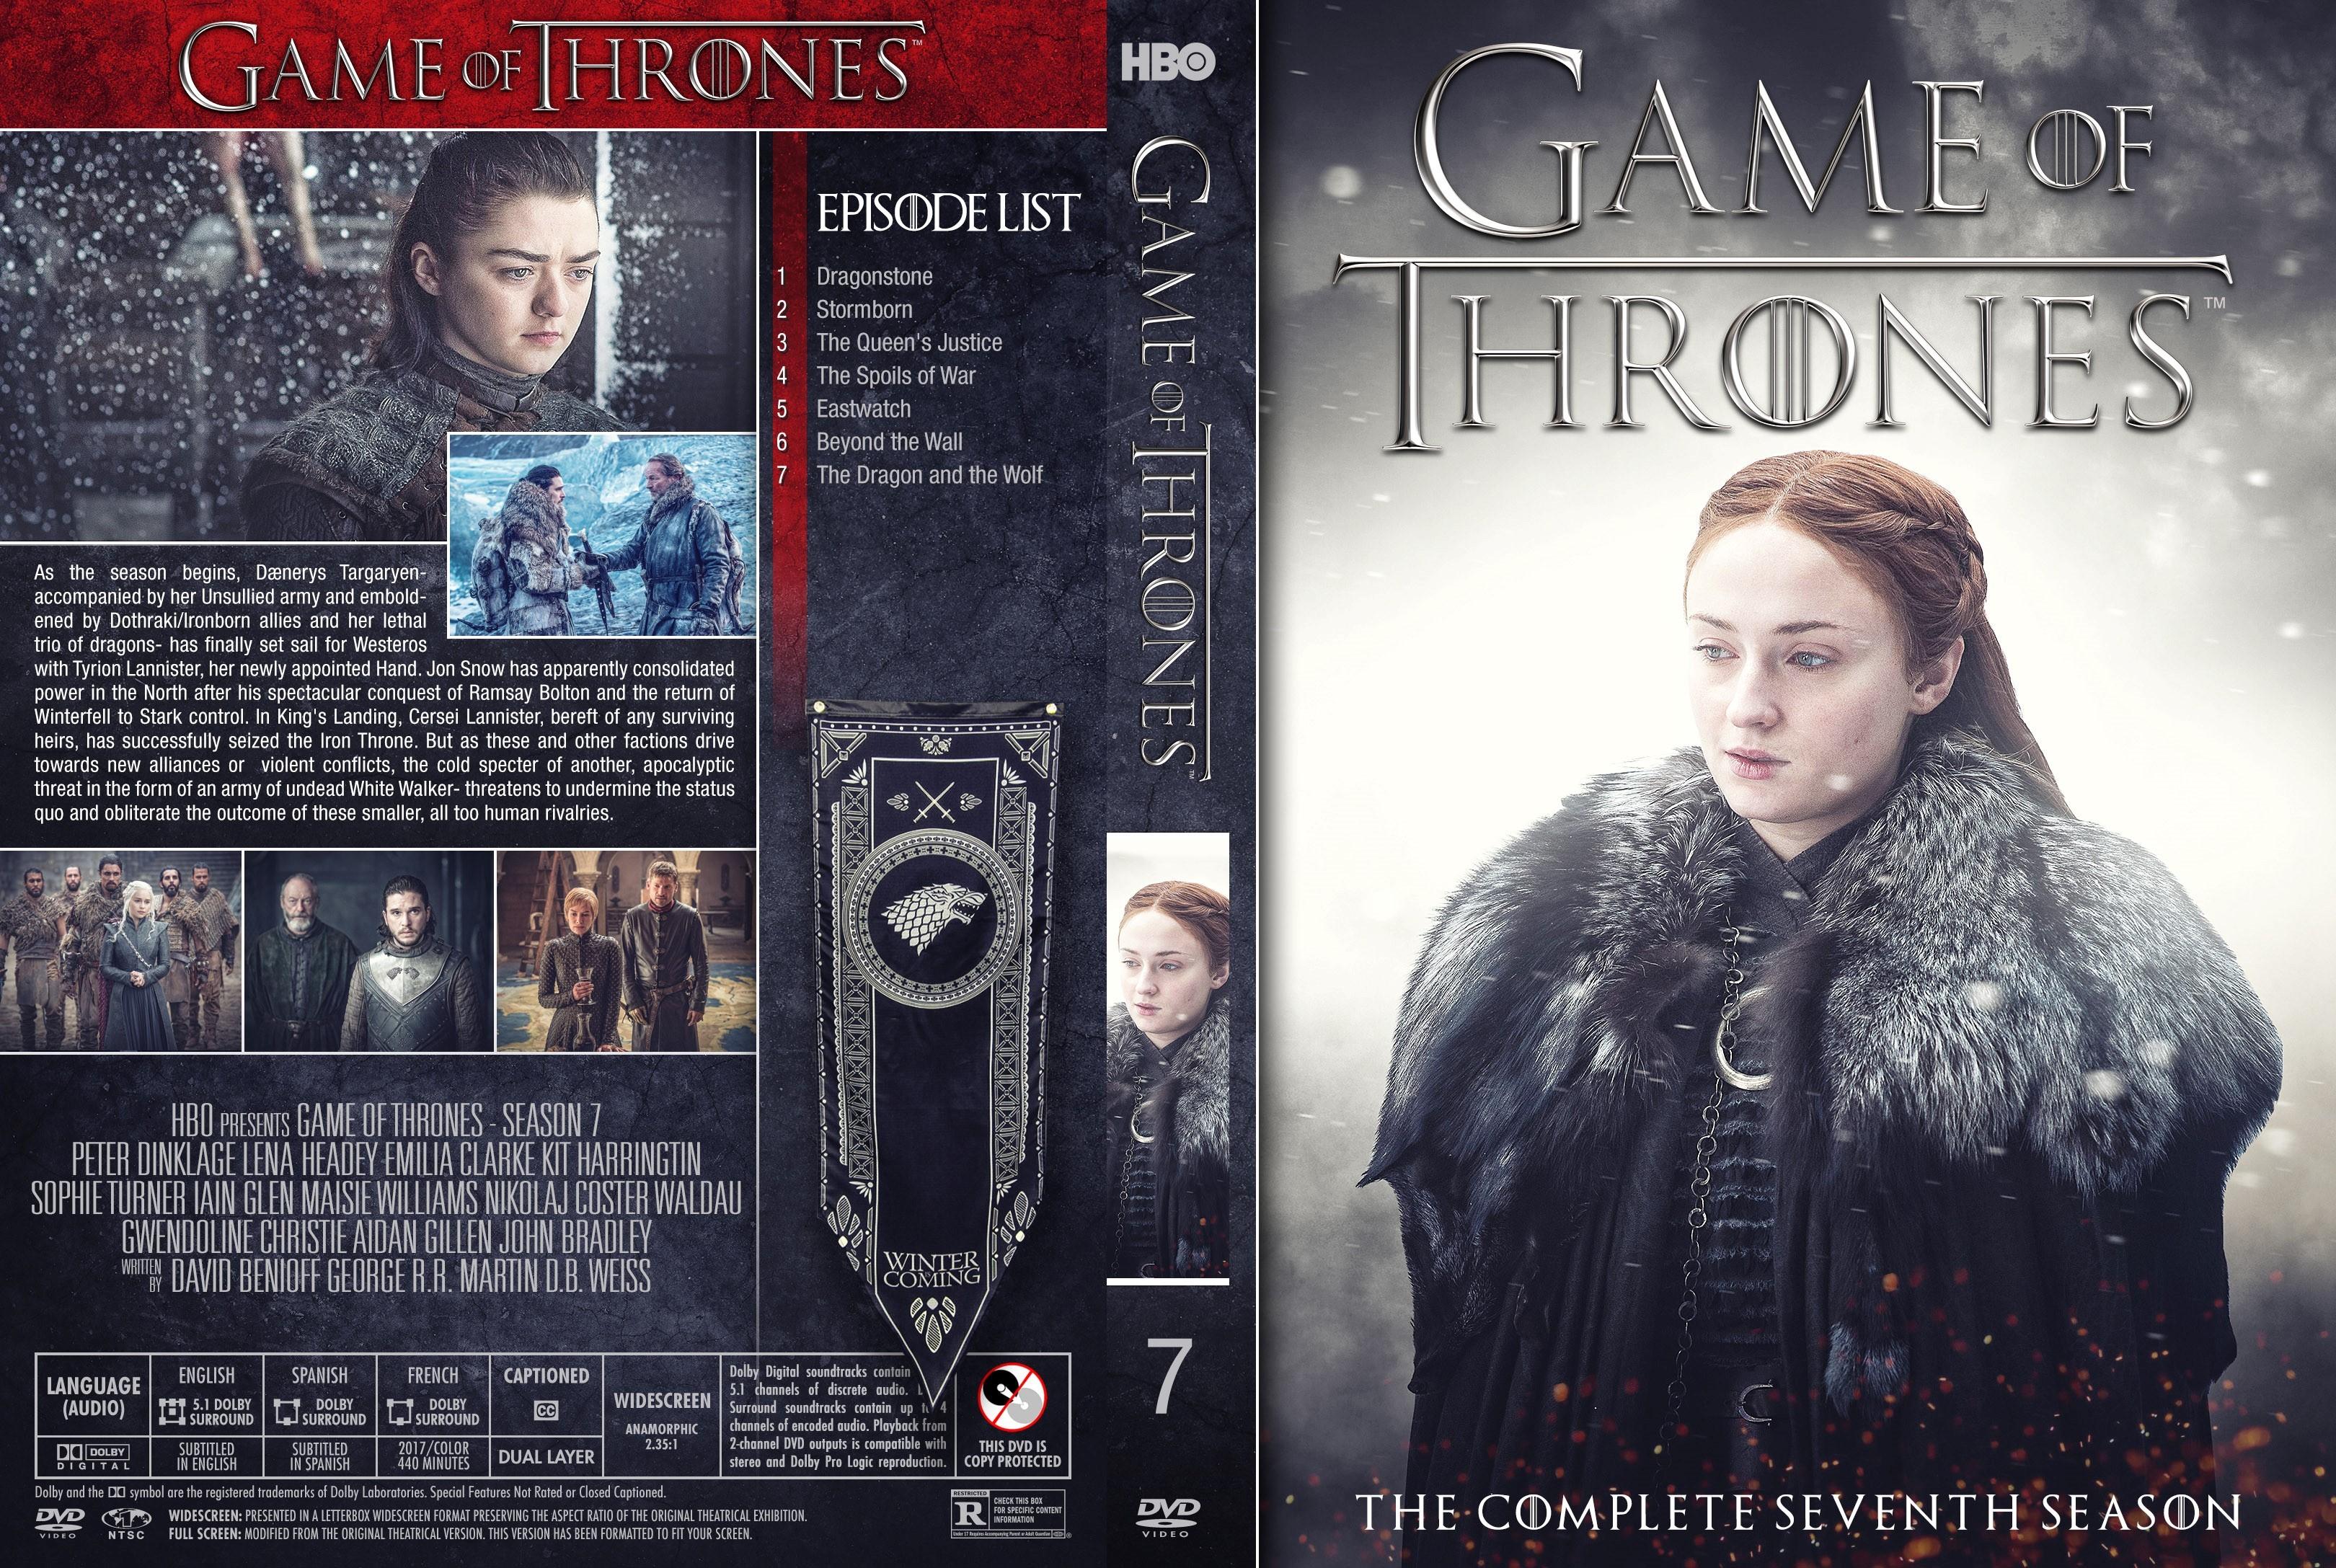 Game Of Thrones Season 7 DVD Cover